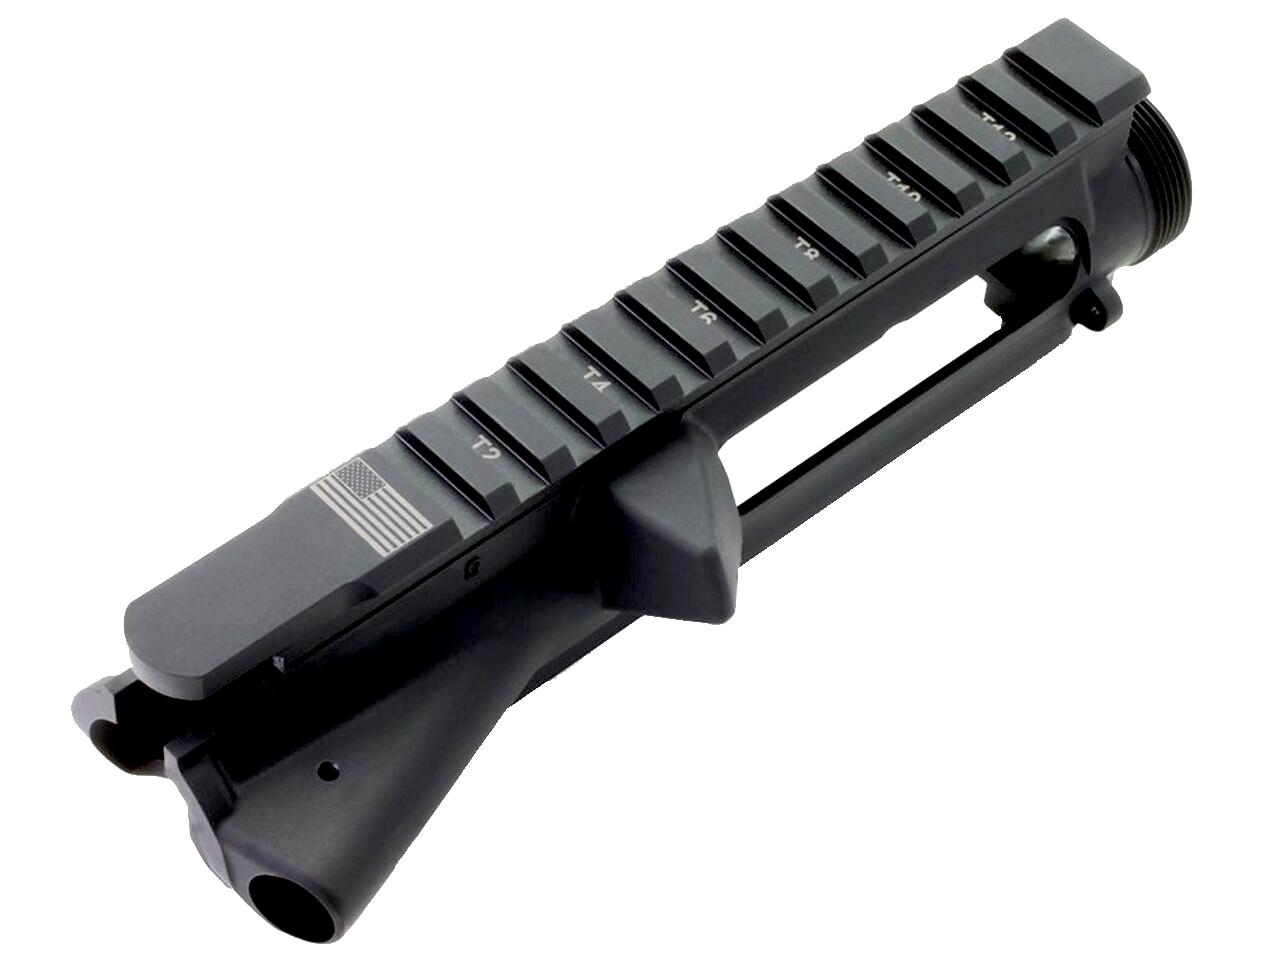 AERO-PRECISION-AR15-Stripped-Upper-Receiver-Black-T-Marked-APAR501602C